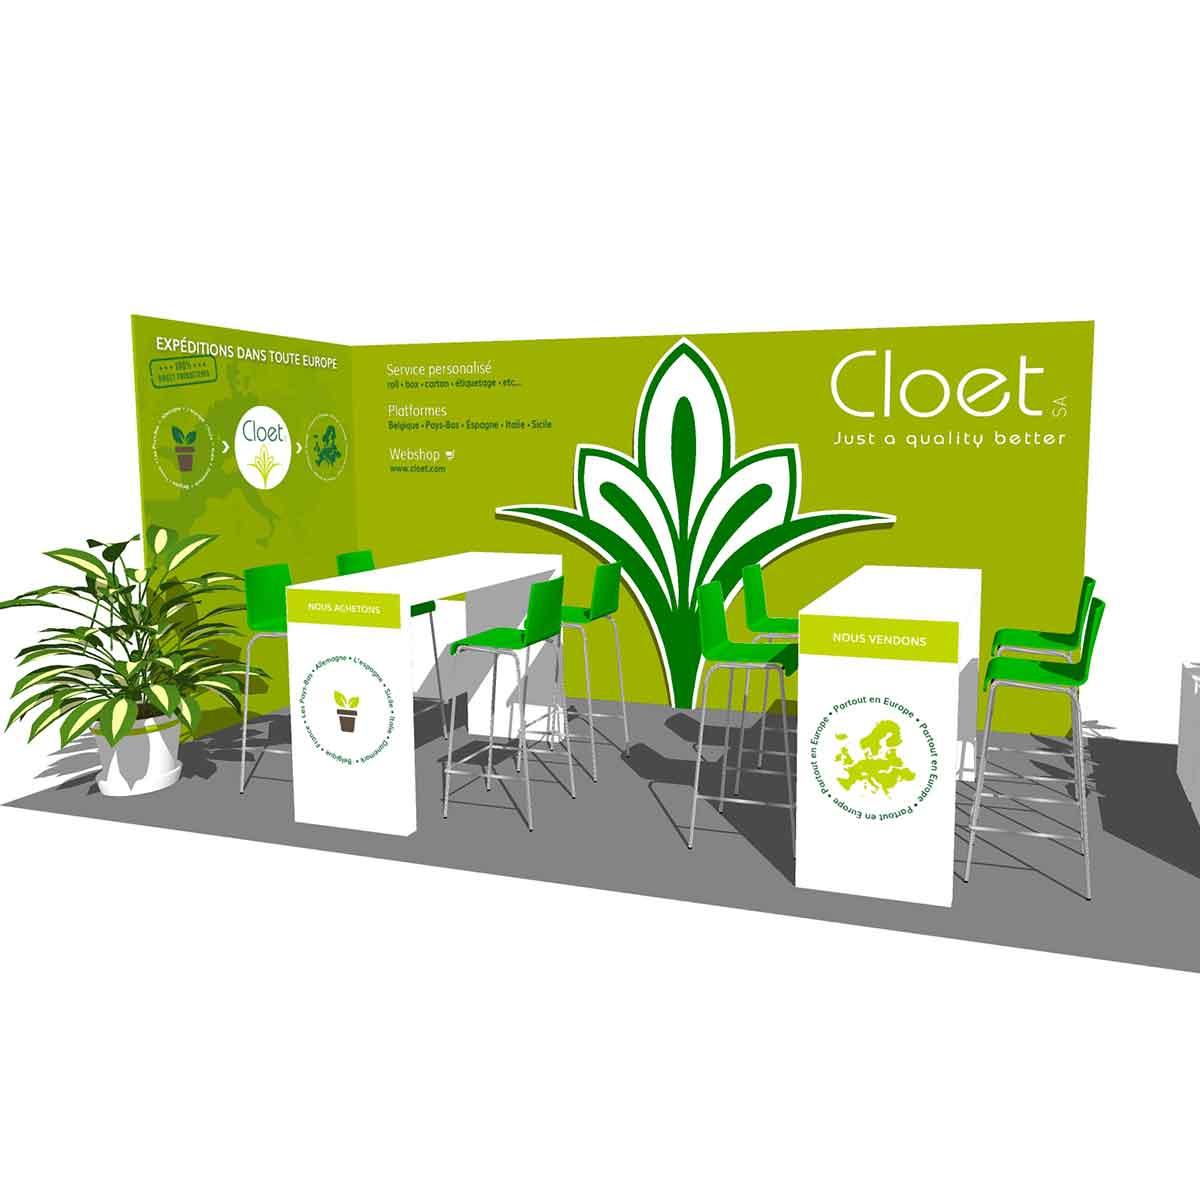 Cloet